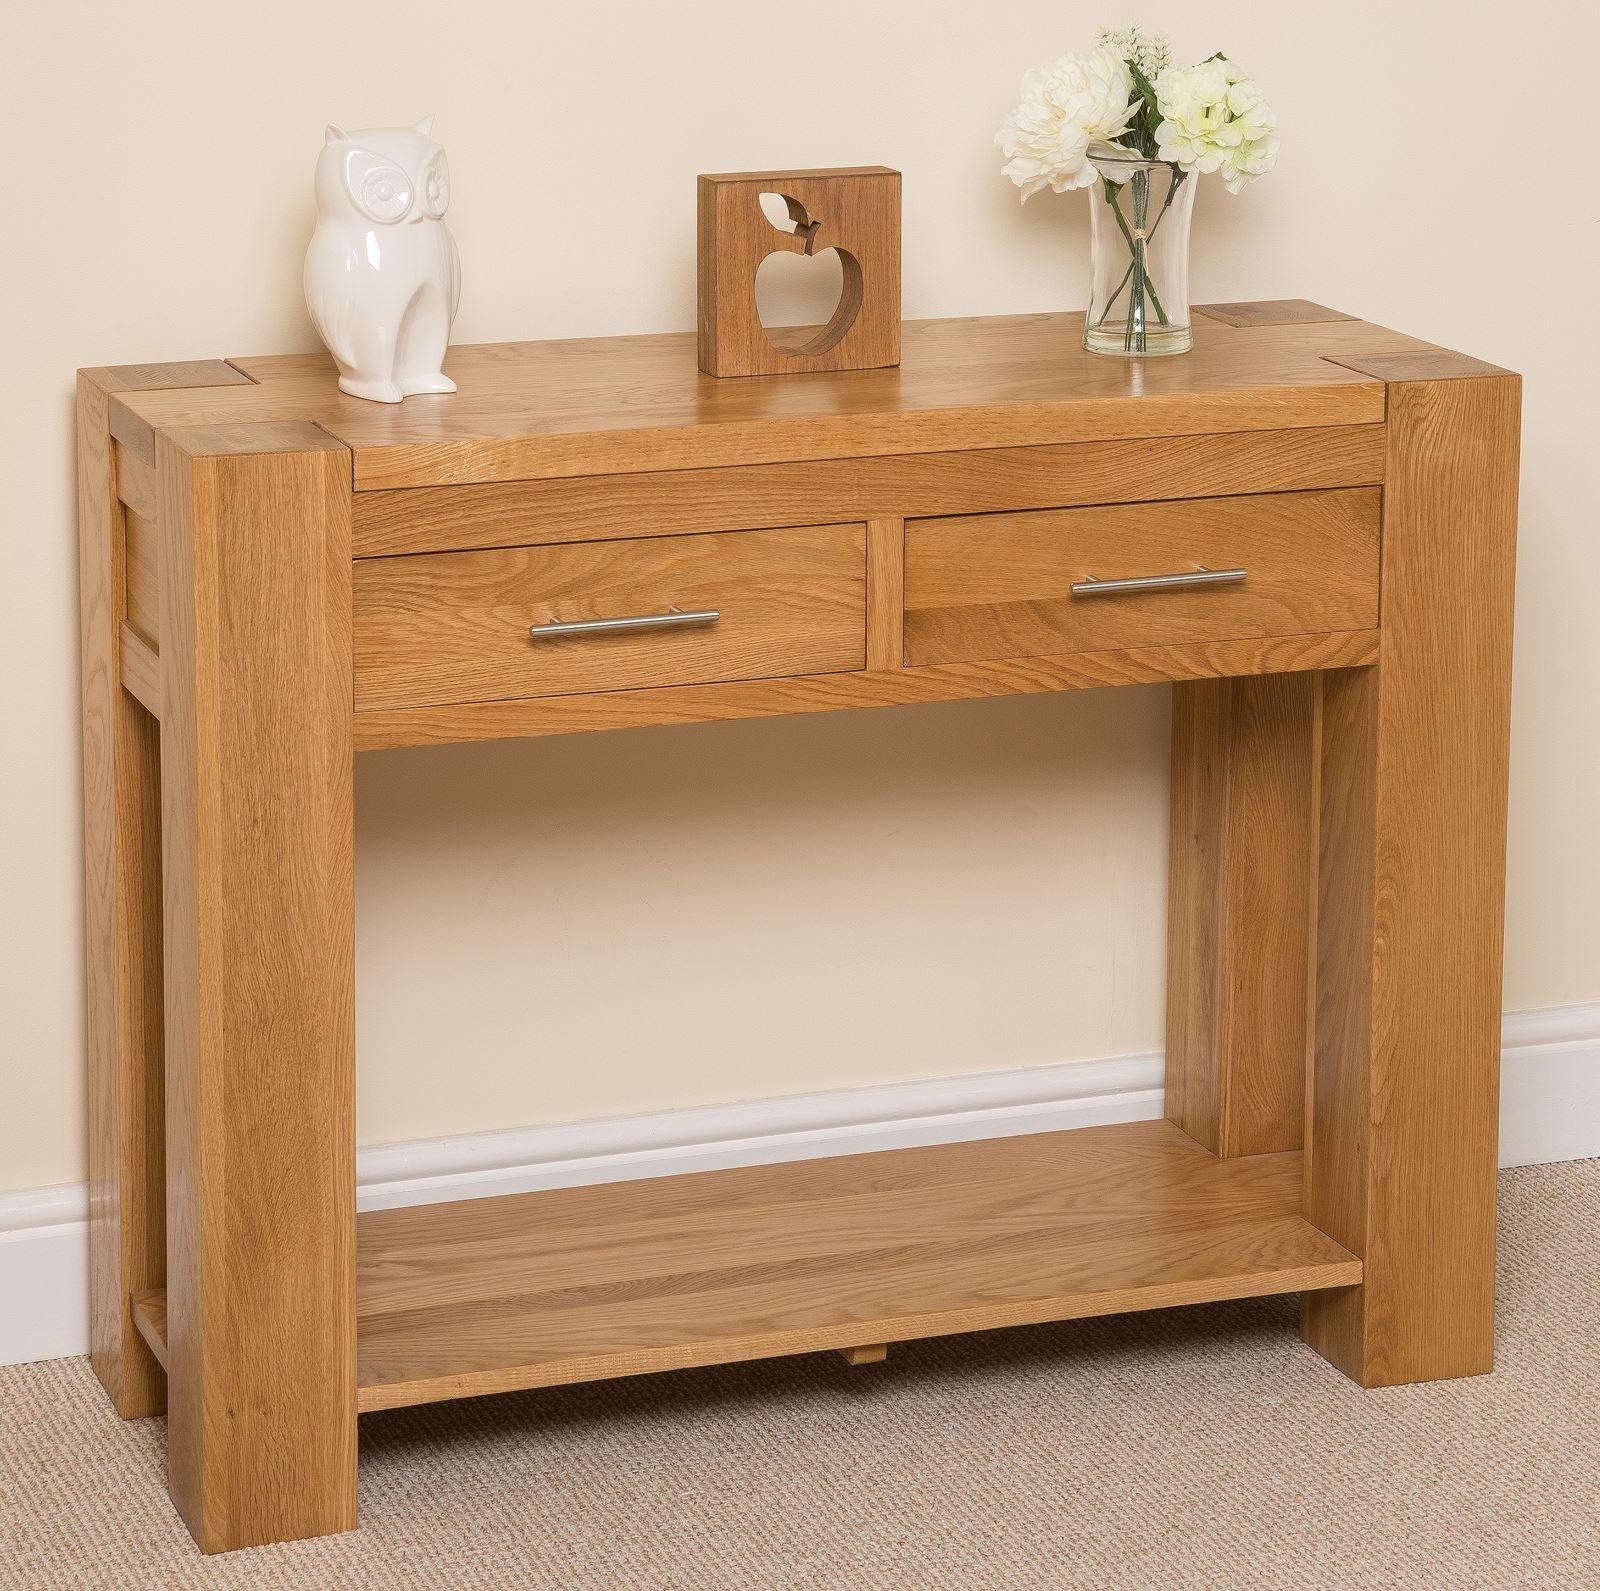 Kuba Chunky Solid Oak Wood 11 Drawer Console Table Unit Hallway Living Room,  11 x 11 x 11 cm